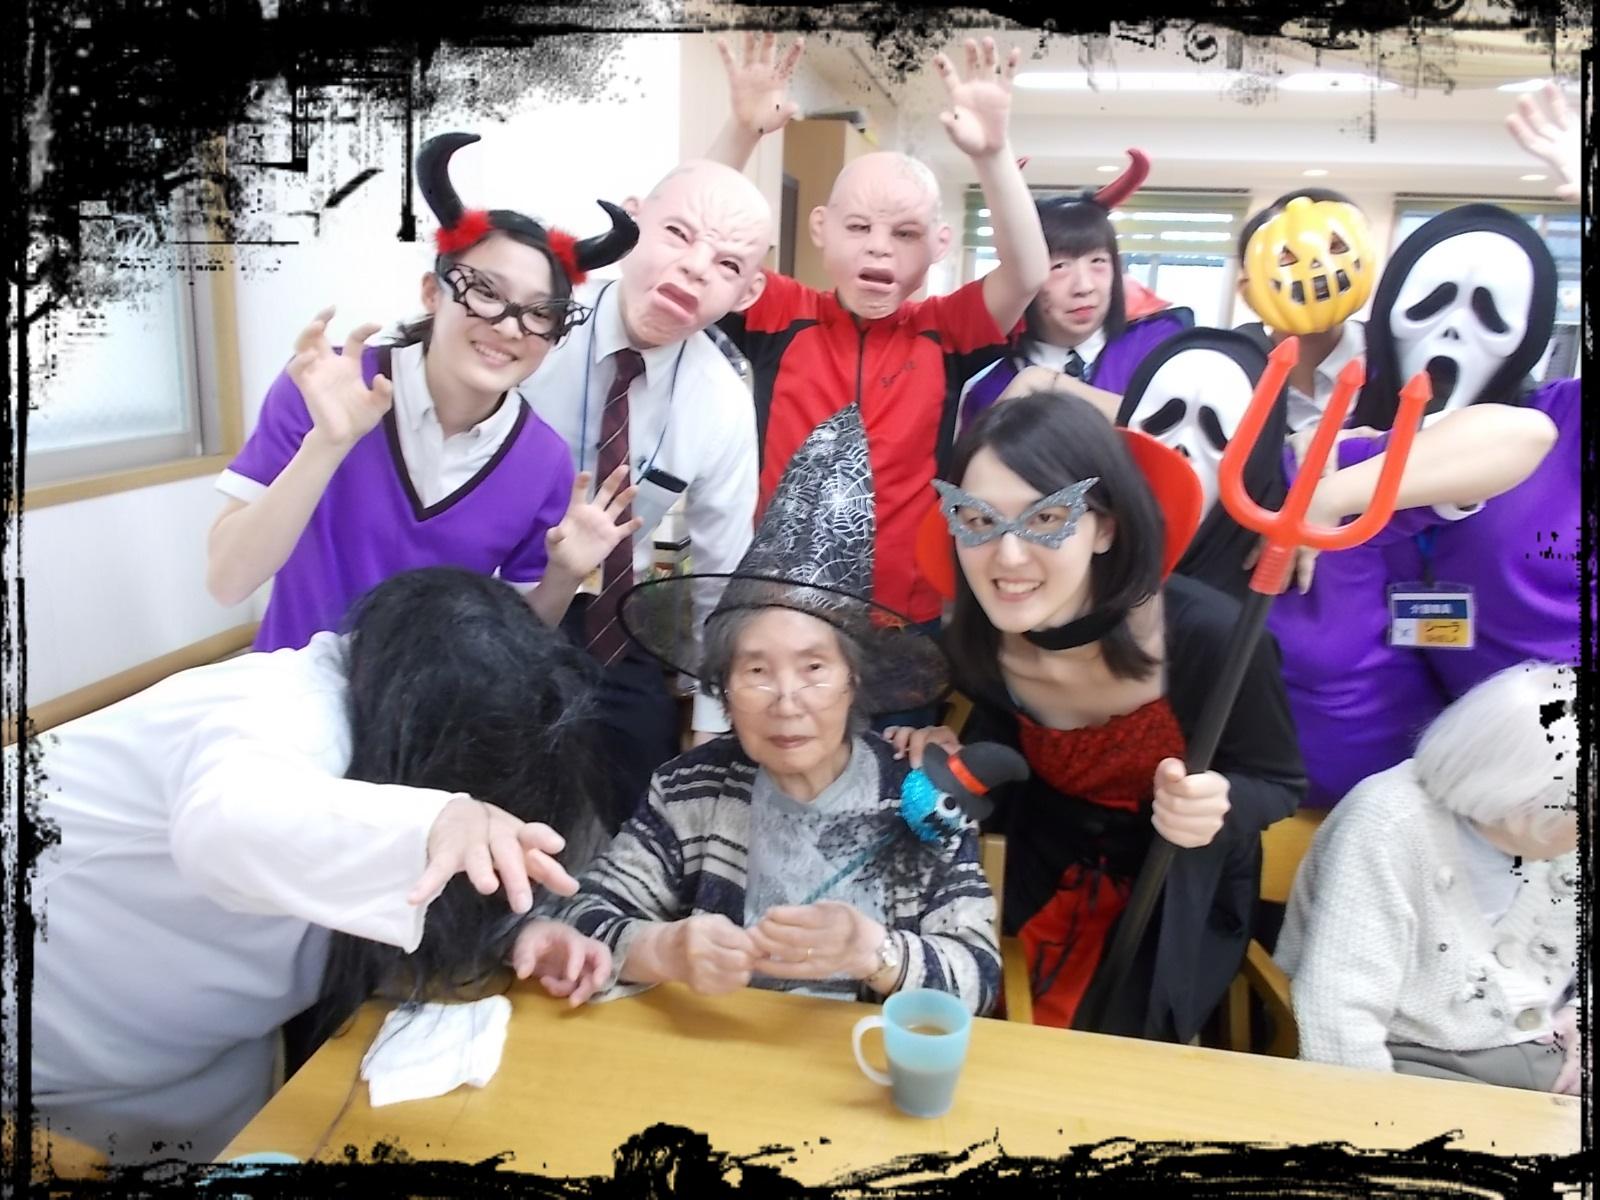 http://www.supercourt.jp/blog/hirano/DSCN1564.JPG